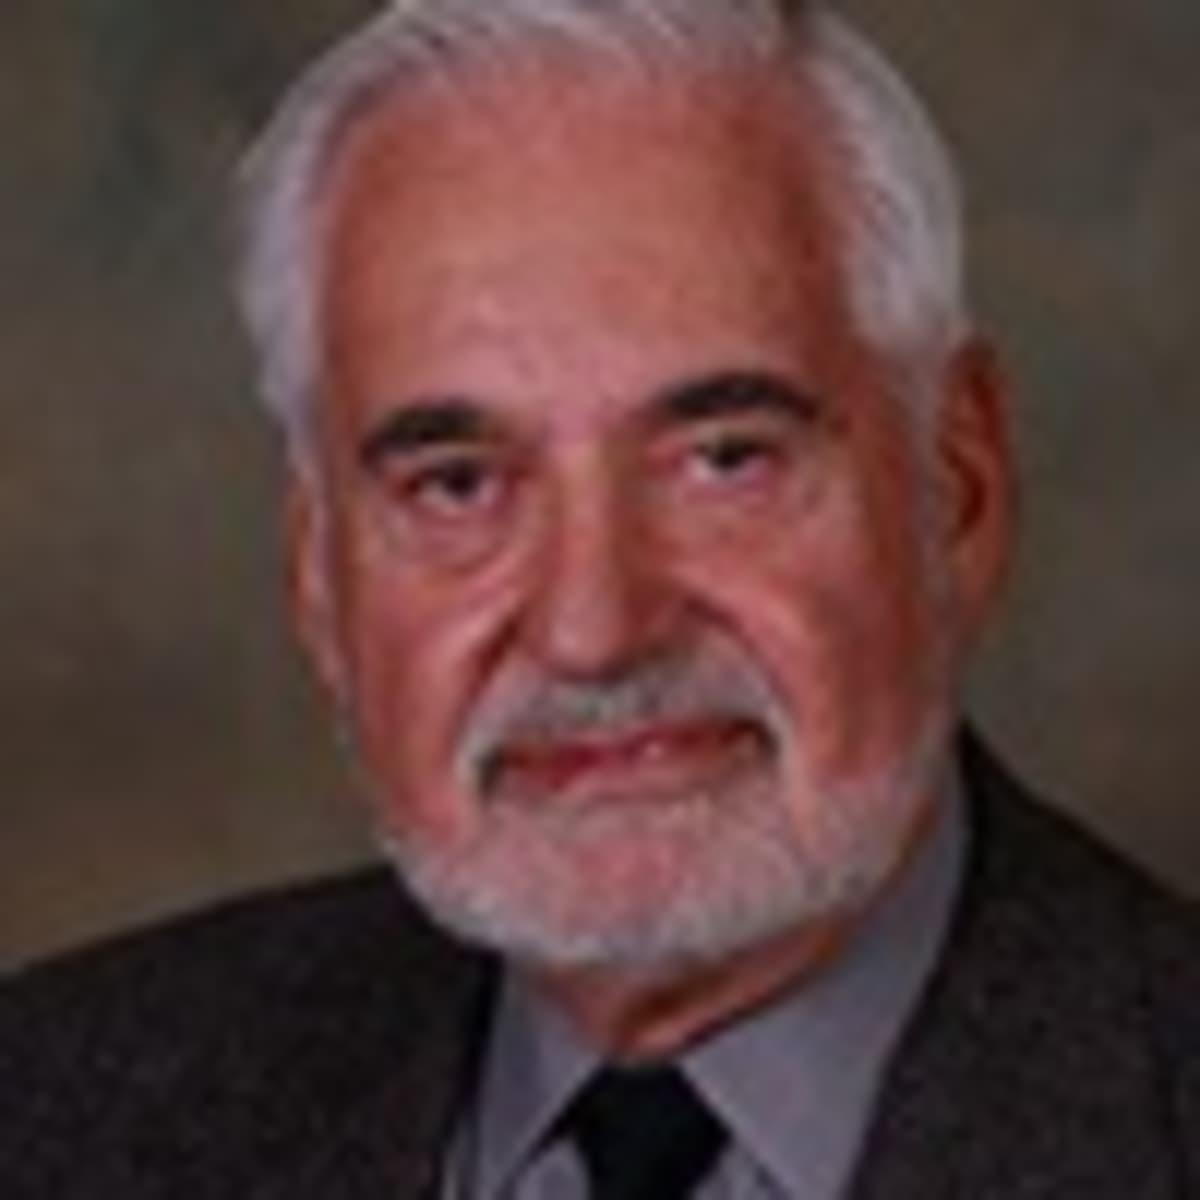 dr jerome dickman md porter ranch ca otolaryngologist